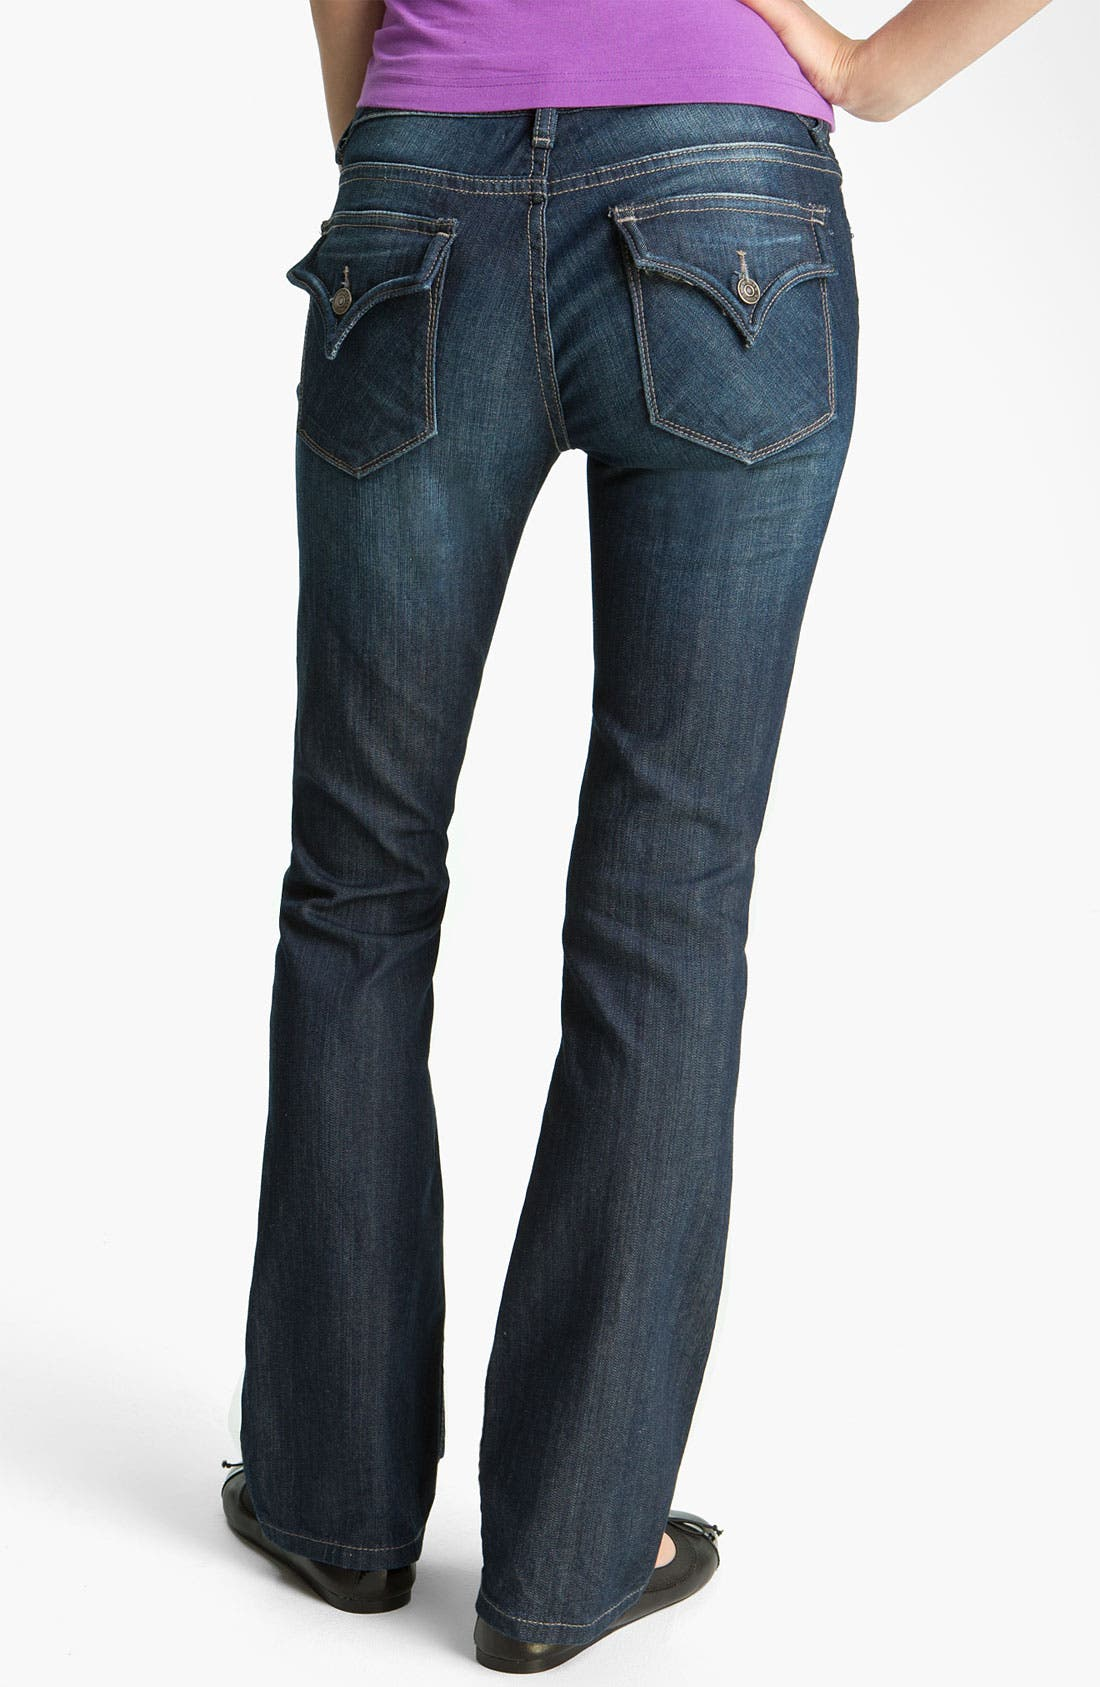 Alternate Image 1 Selected - Vigoss 'Seattle' Bootcut Jeans (Juniors)